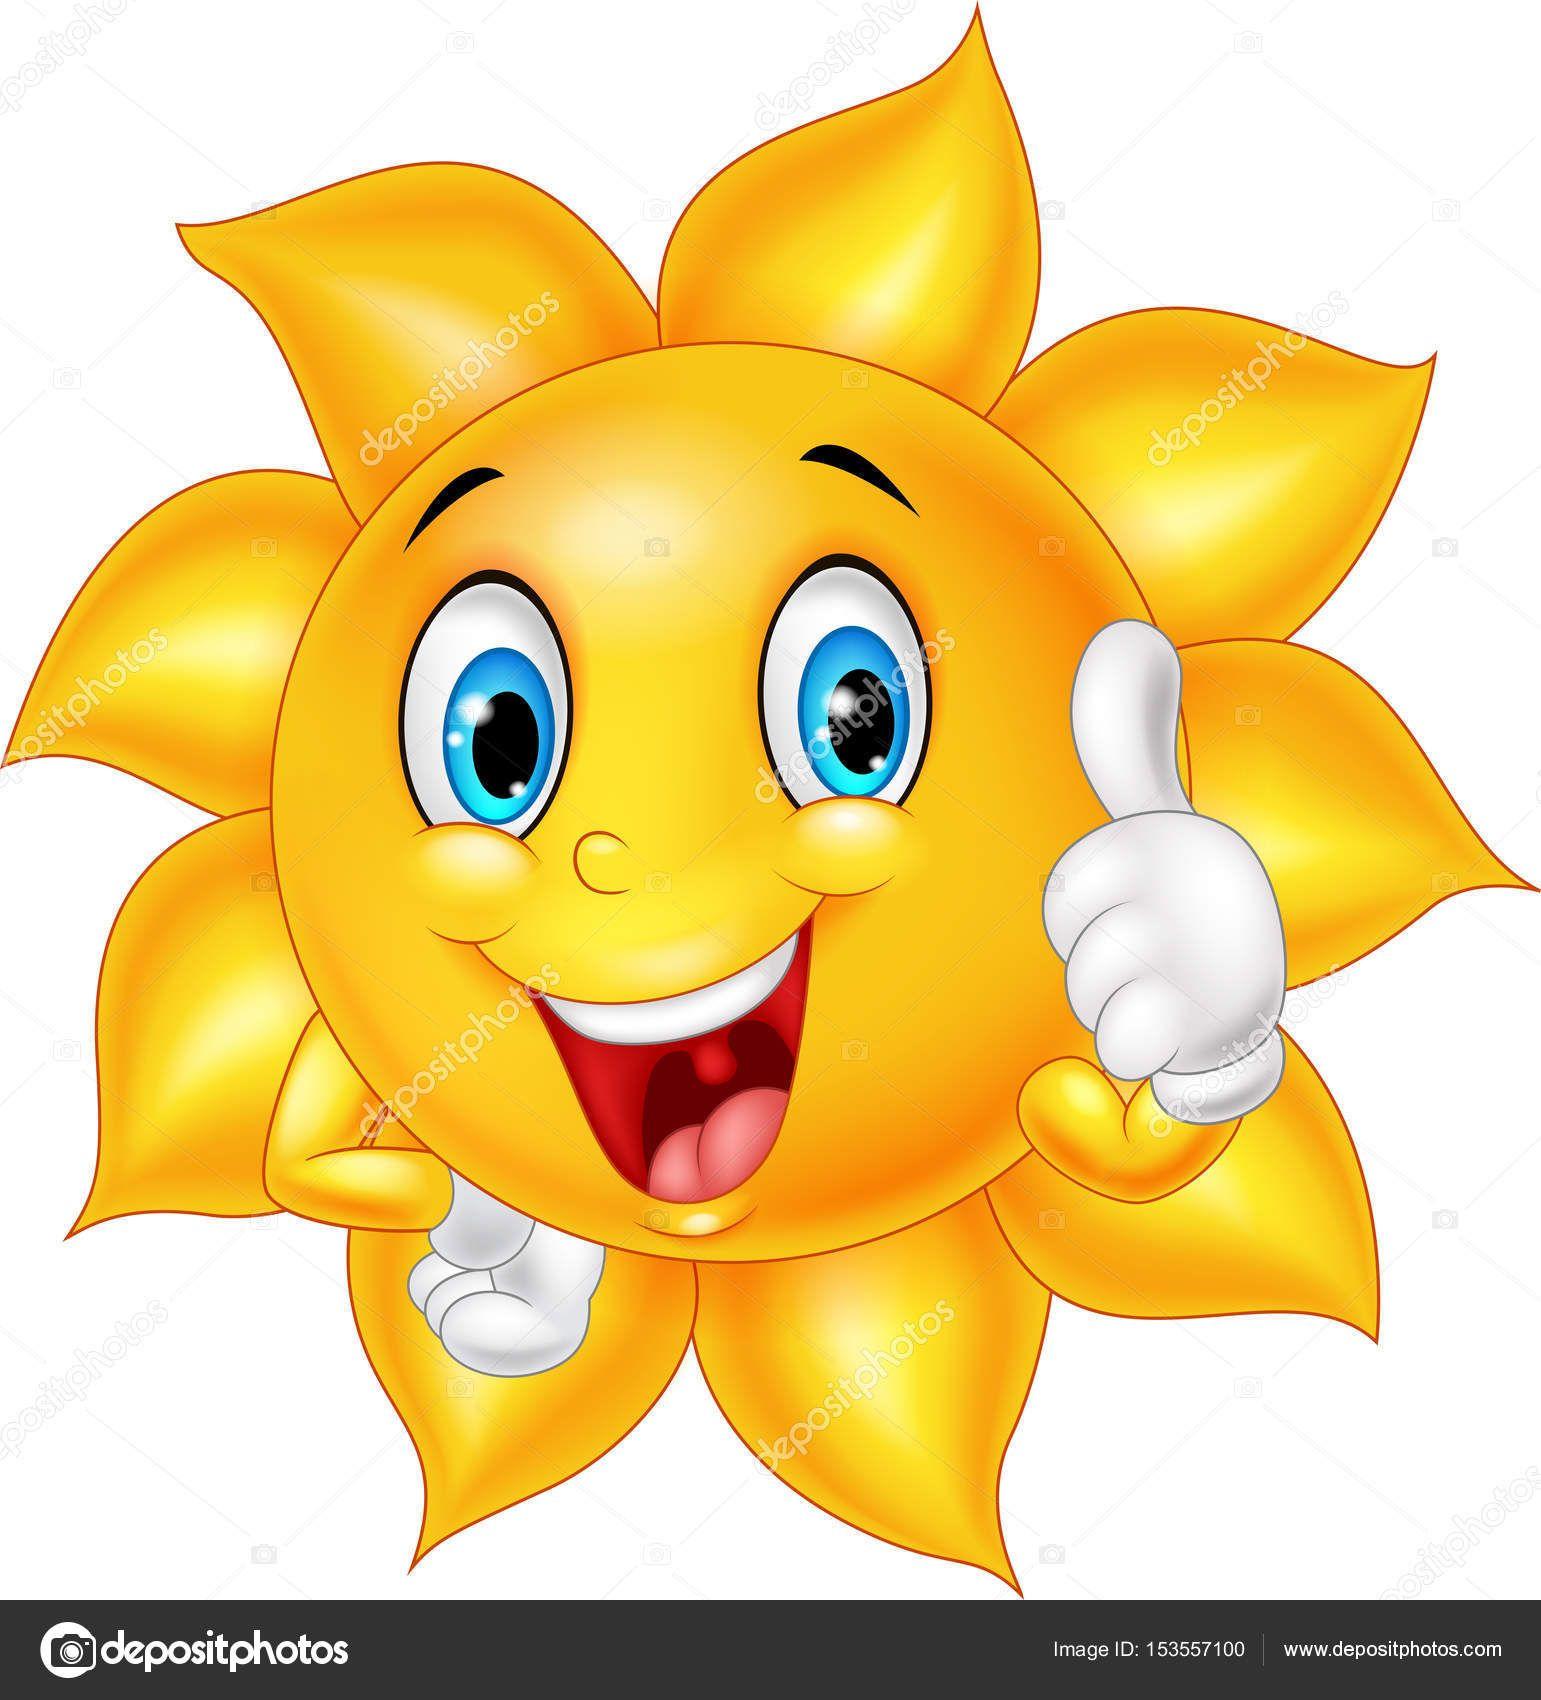 Pin En Imagenes De Soles